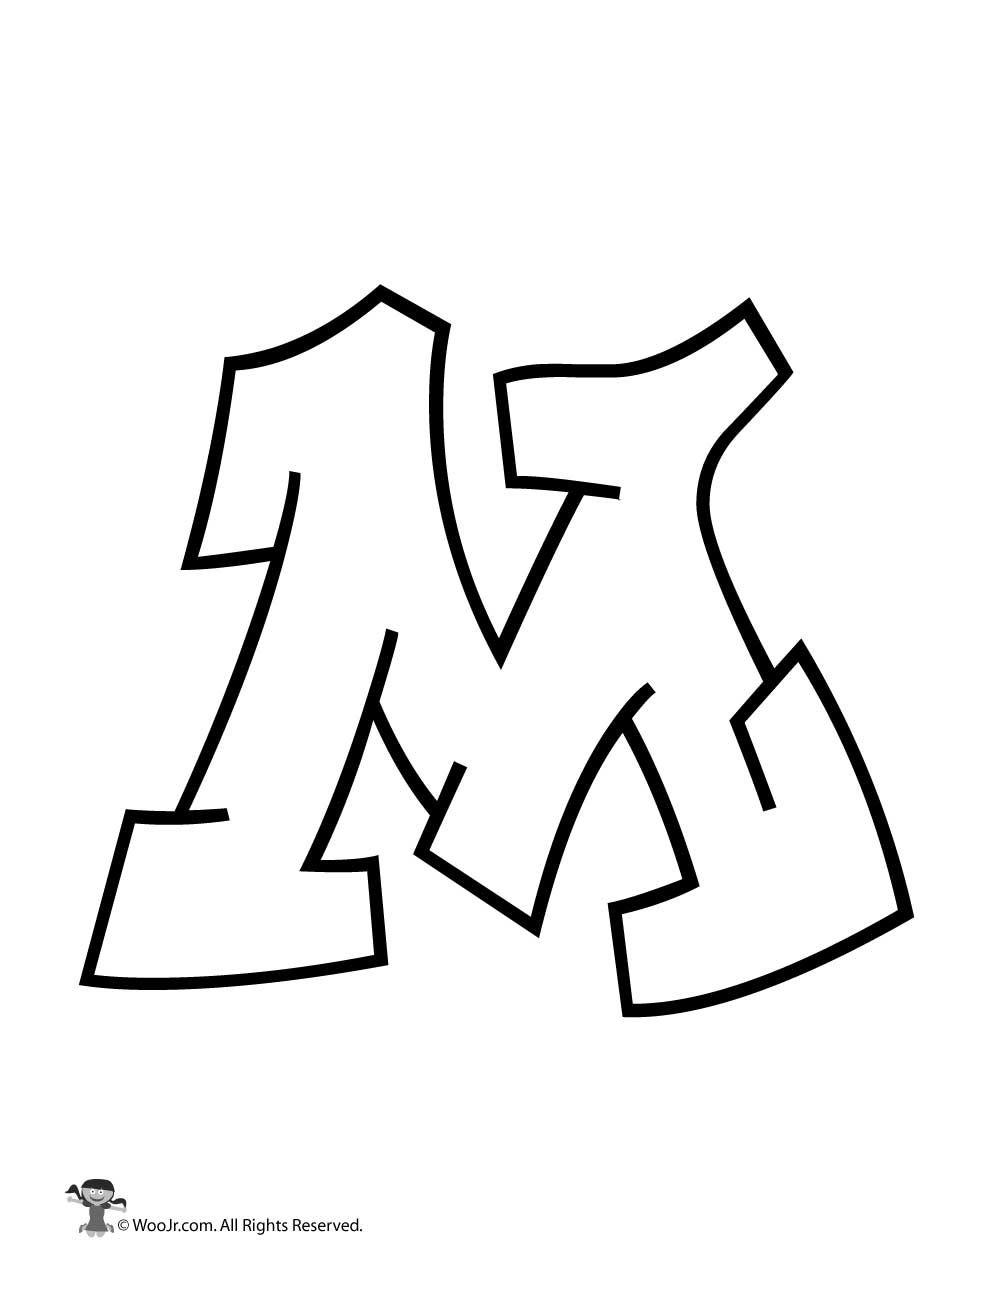 Graffiti Capital Letter M In 2020 Graffiti Lettering Graffiti